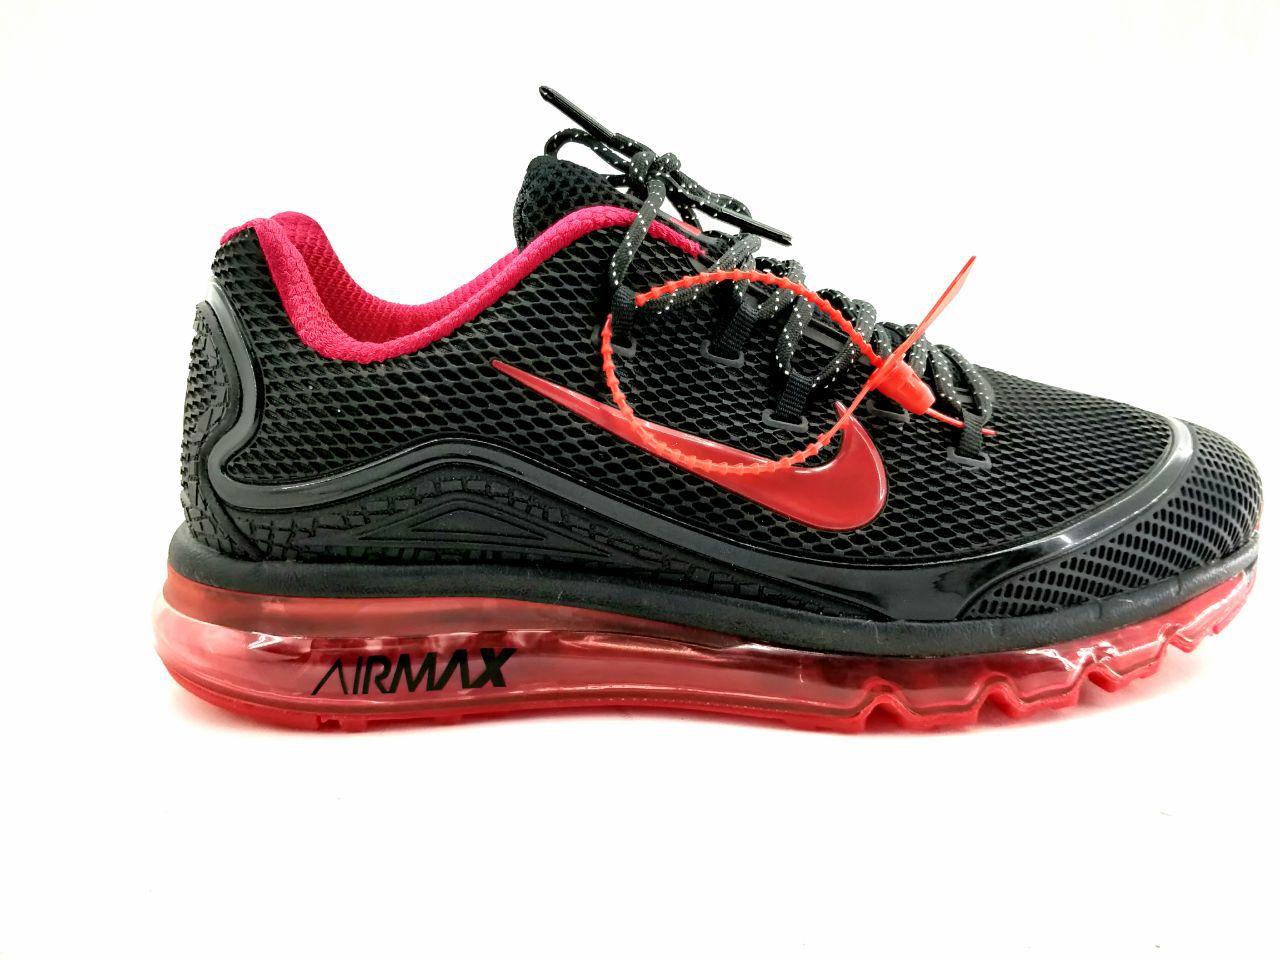 Nike Airmax 2018 Elite Red Running Shoes - Buy Nike Airmax 2018 ...